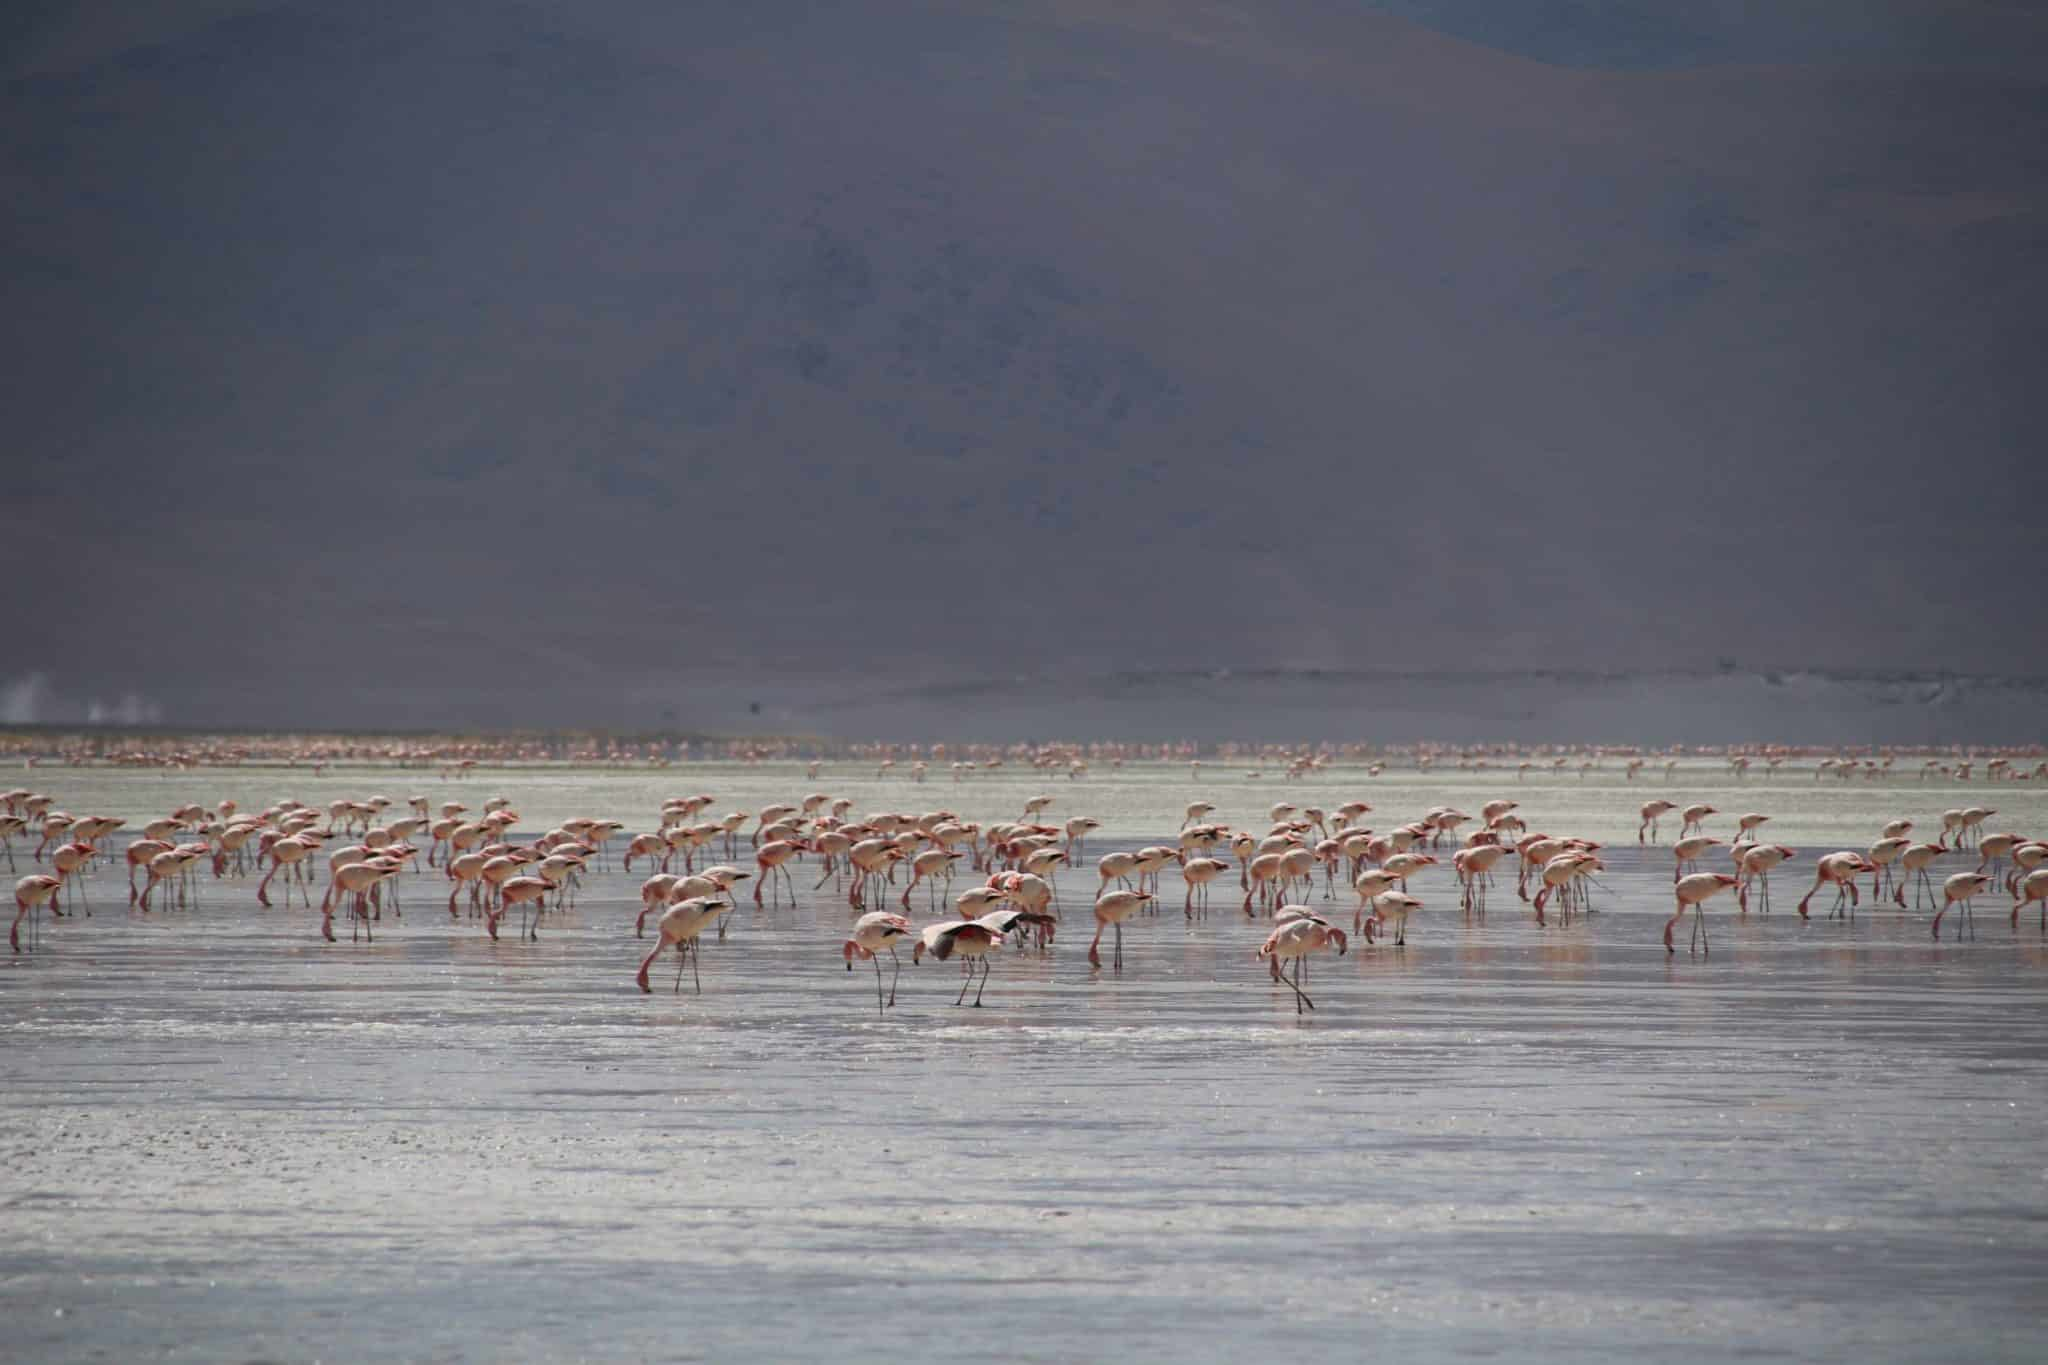 laguna colorada flamants roses réserve eduardo avaroa